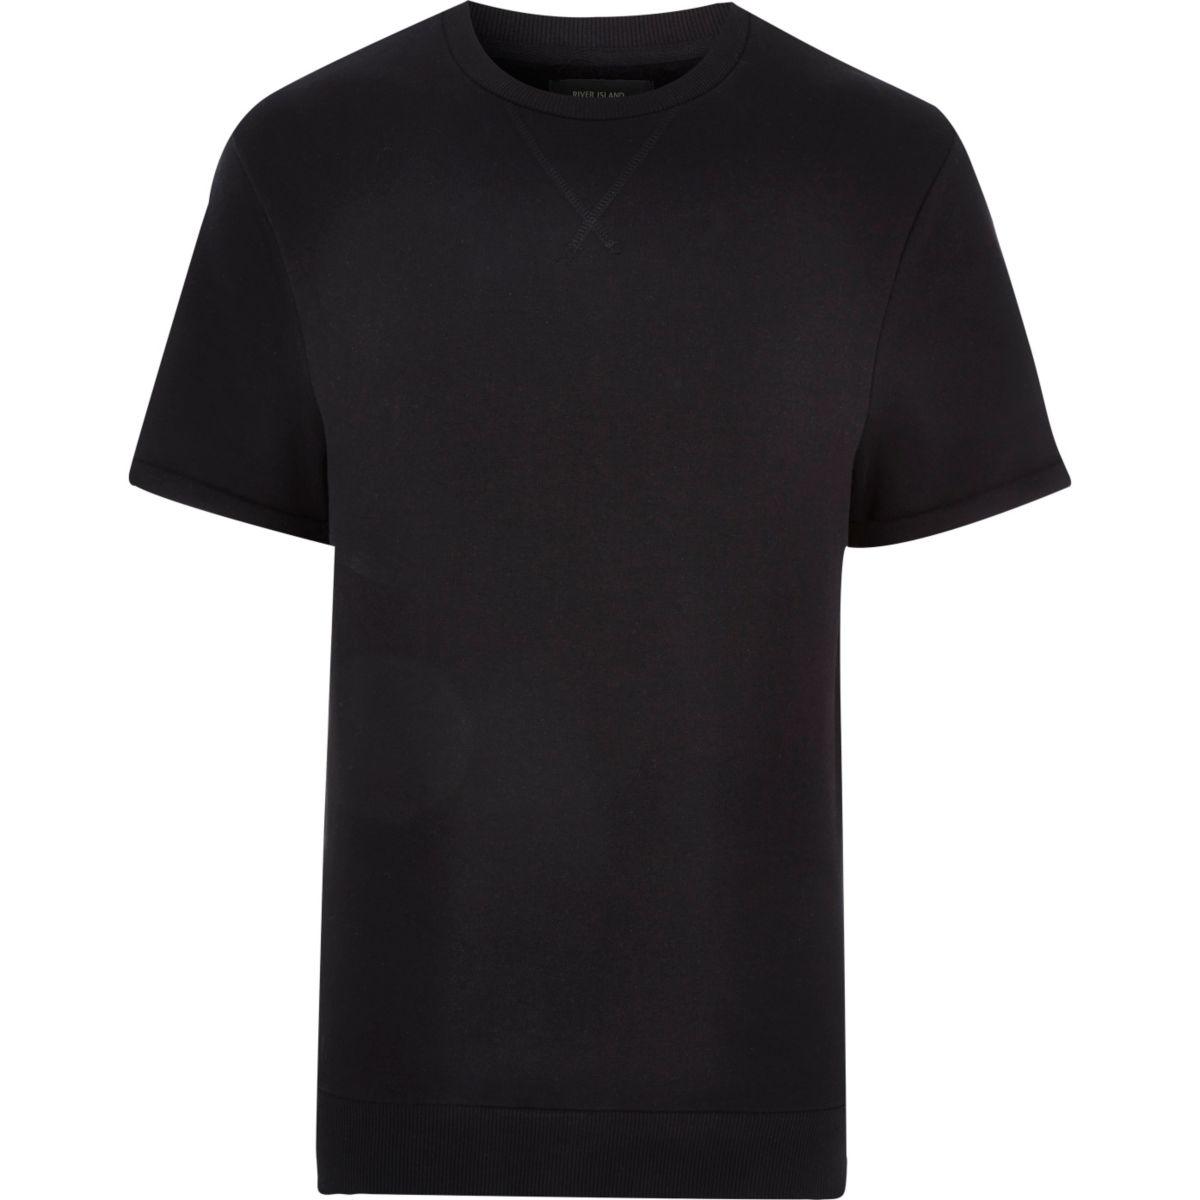 Black rolled up short sleeve sweatshirt